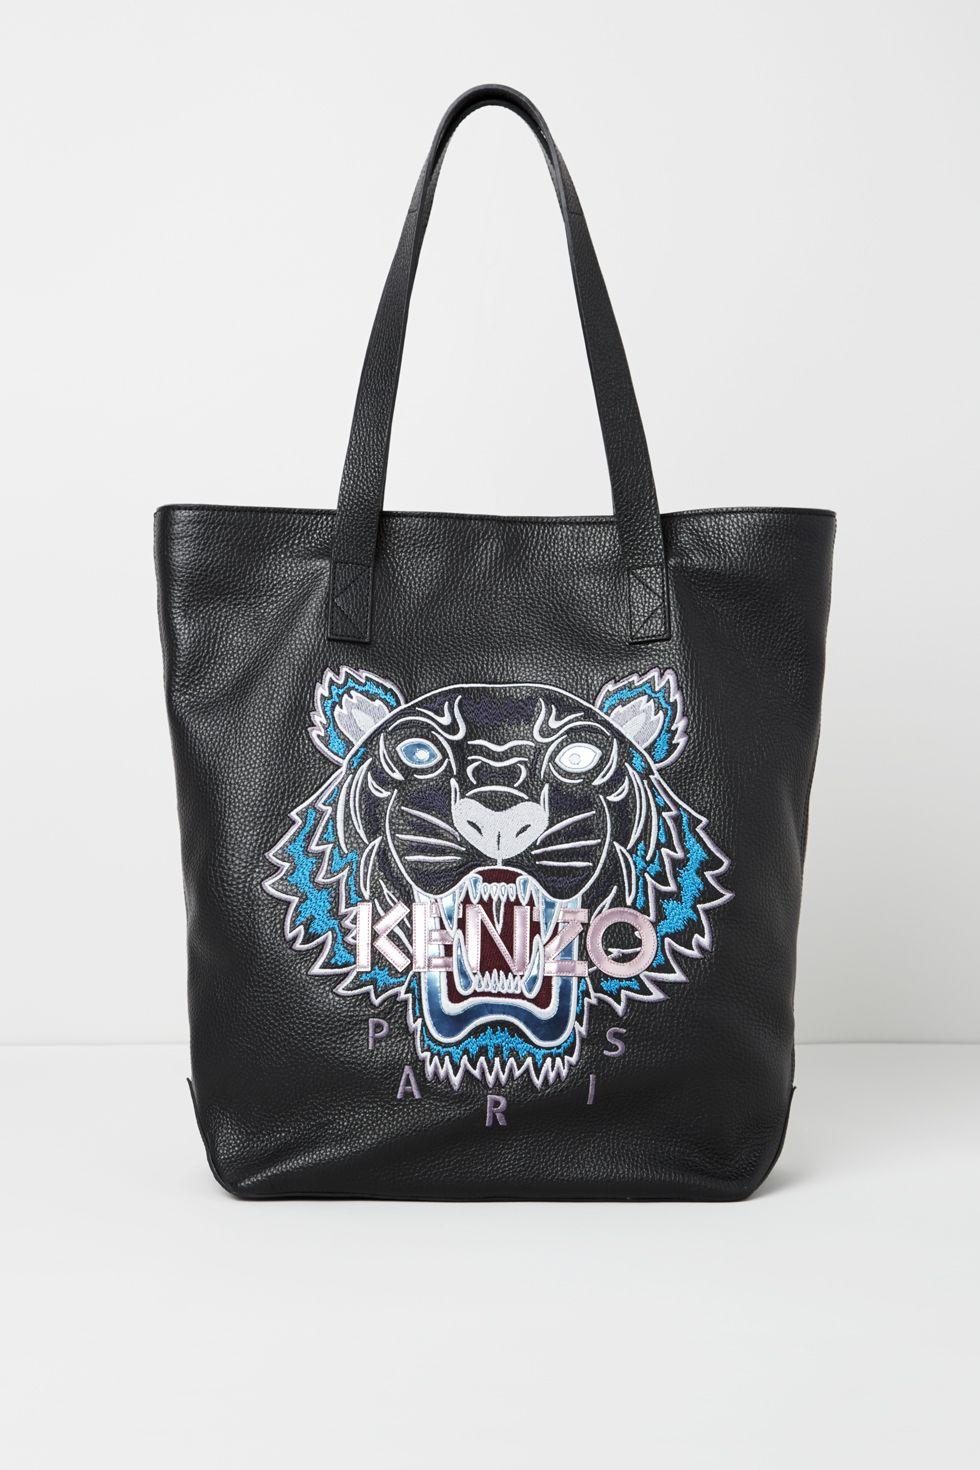 Kenzo Tiger Tote Bag - Kenzo Icons Women - Kenzo E-shop  a62d18b3a7